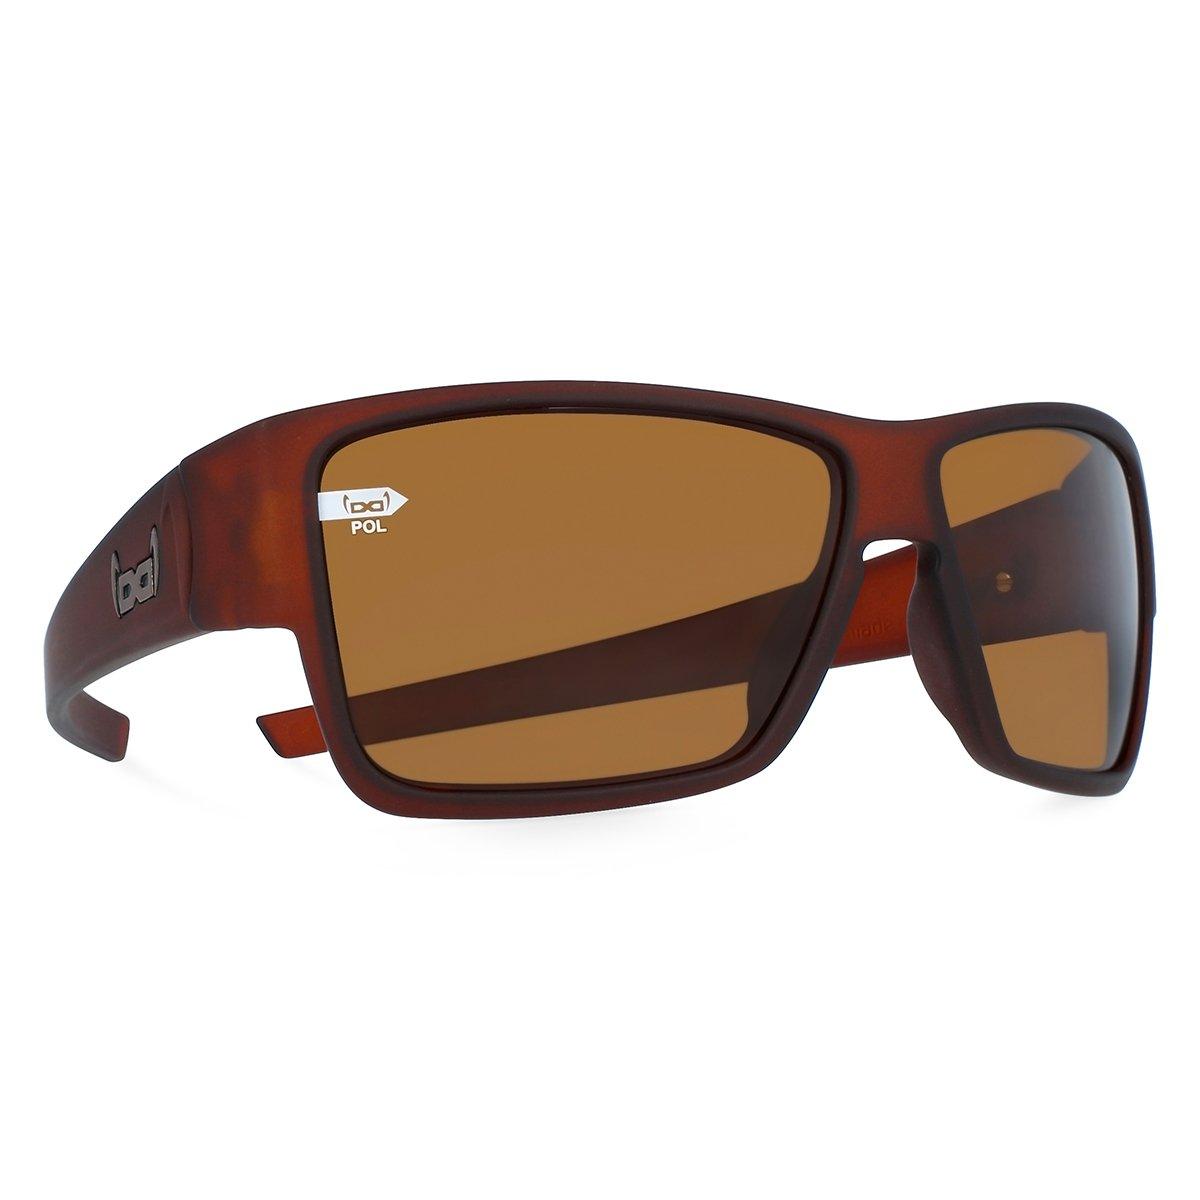 Gloryfy unbreakable eyewear Sonnenbrille G14 Contour POL, braun